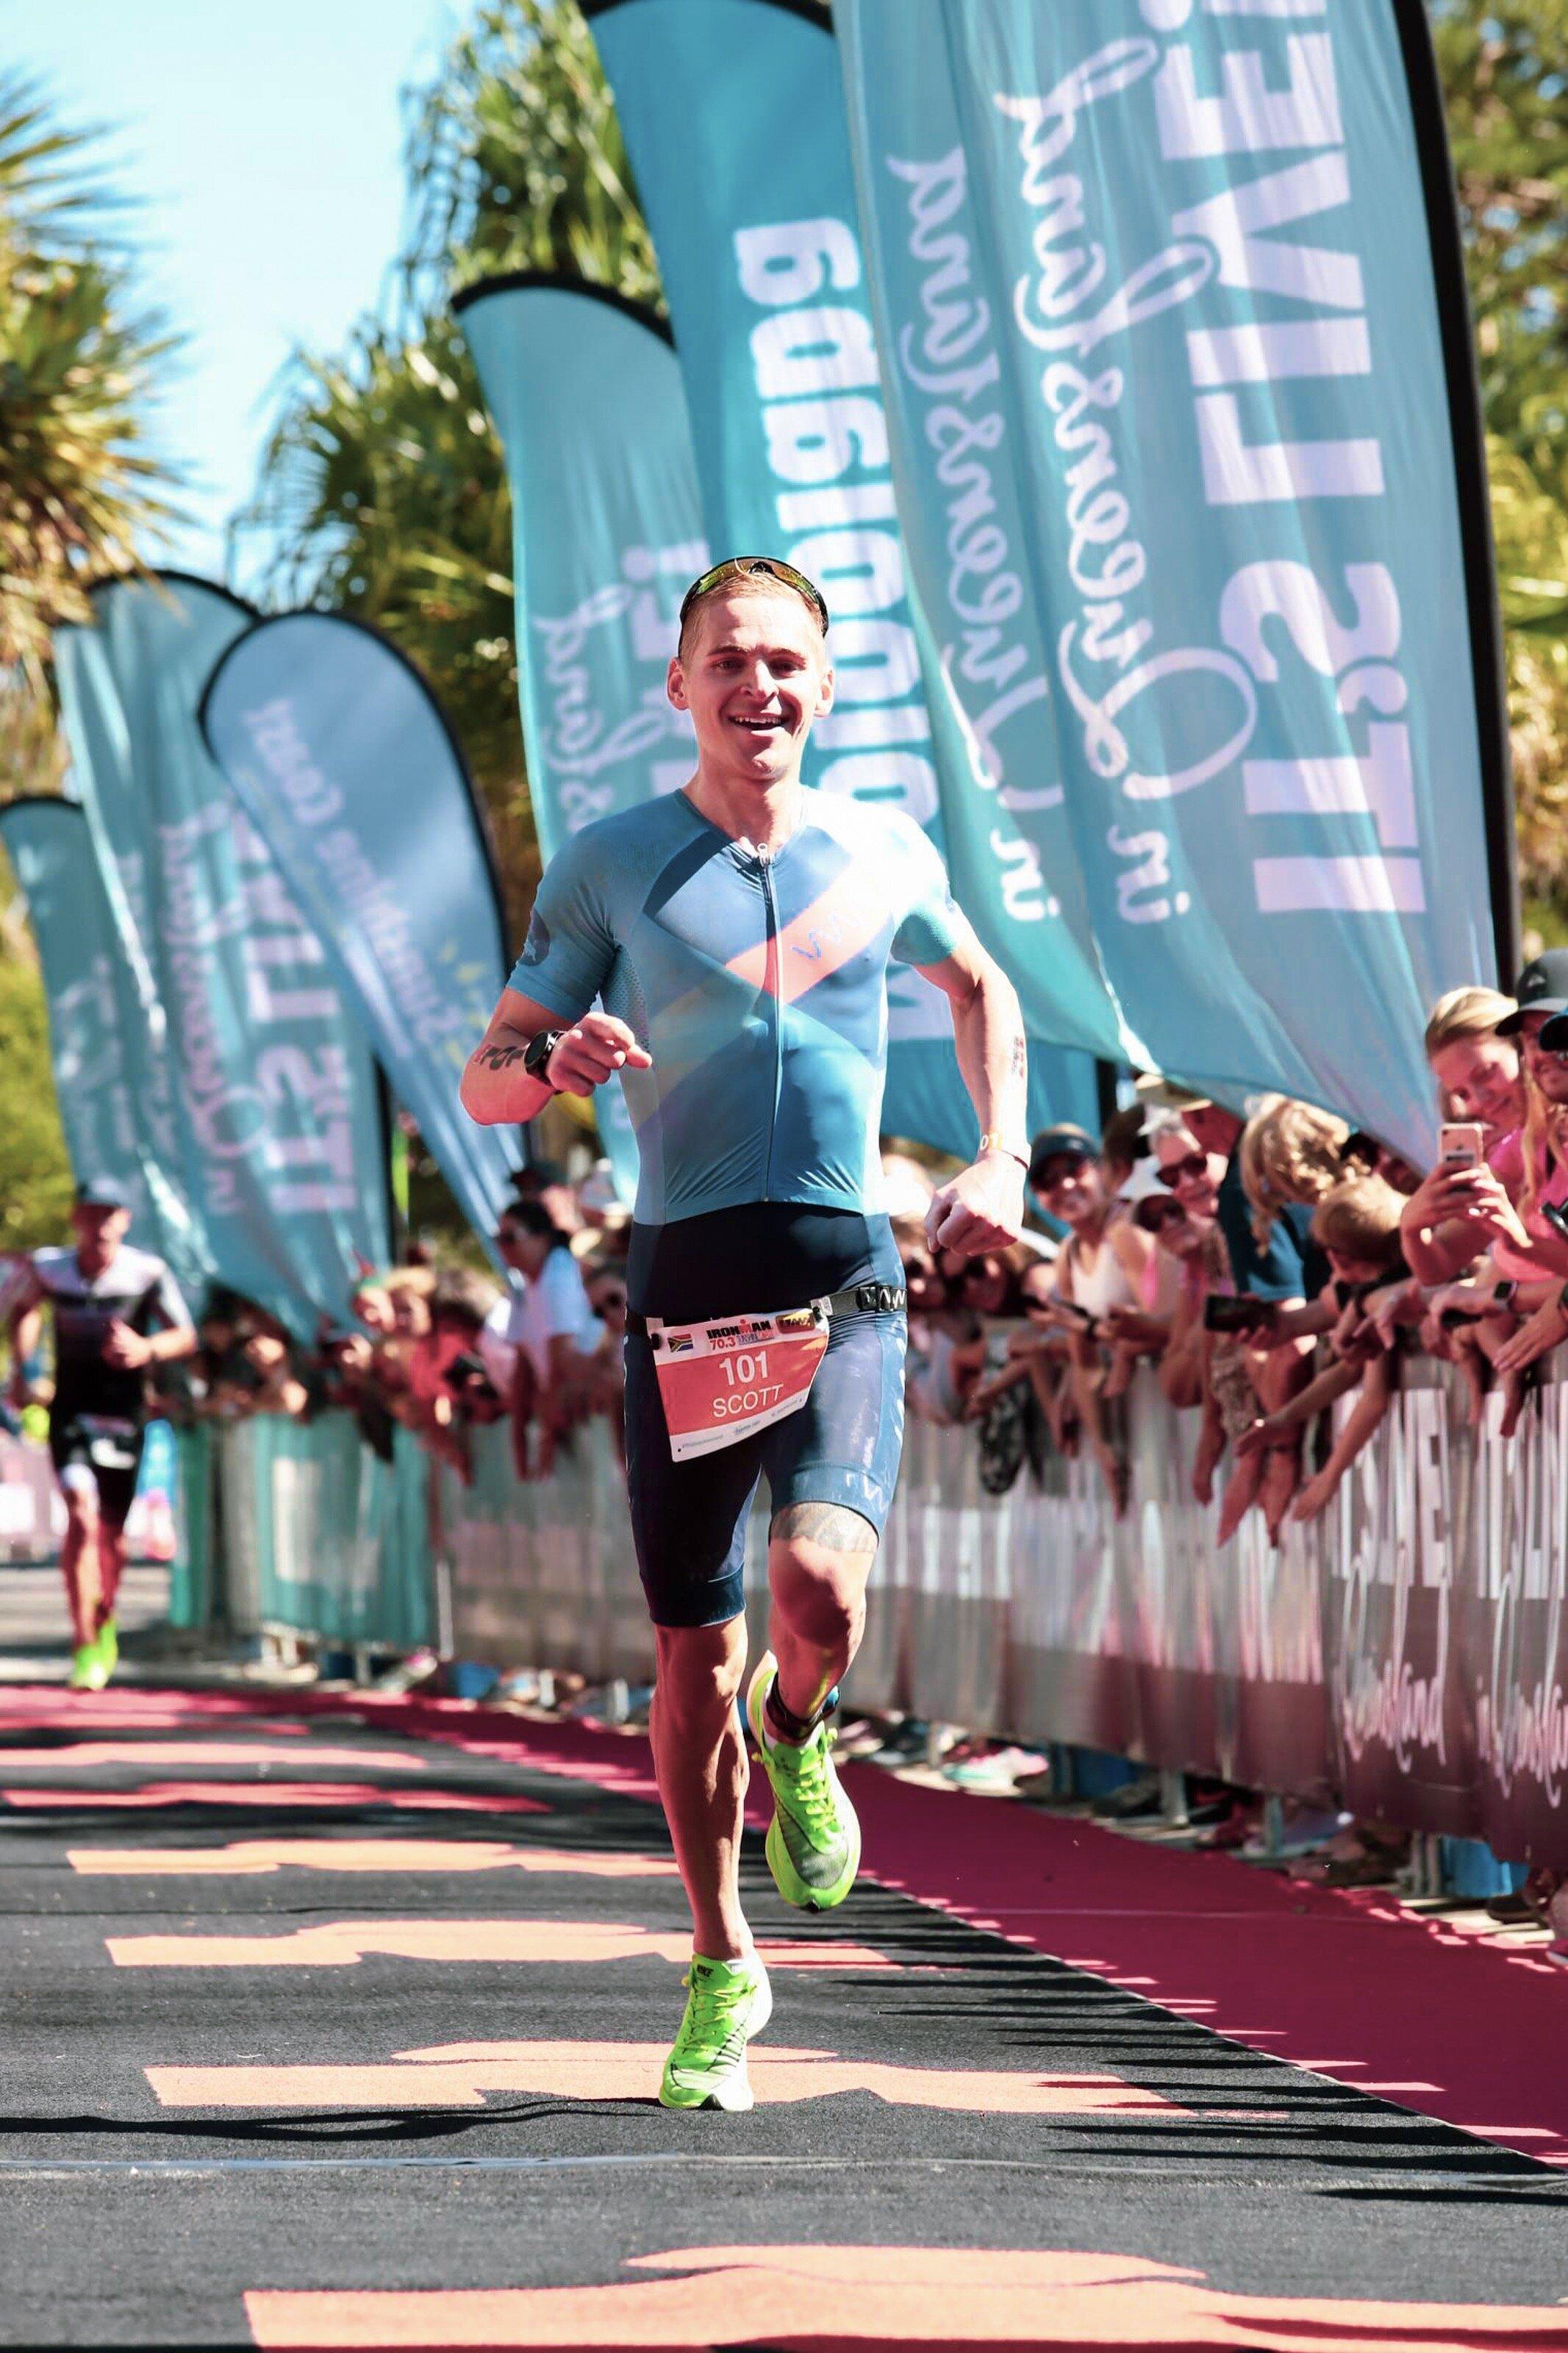 Coach_Terry_Wilson_Pursuit_of_The_Perfect_Race_IRONMAN_Sunshine_Coast_Scott_Bayvel_2.jpeg